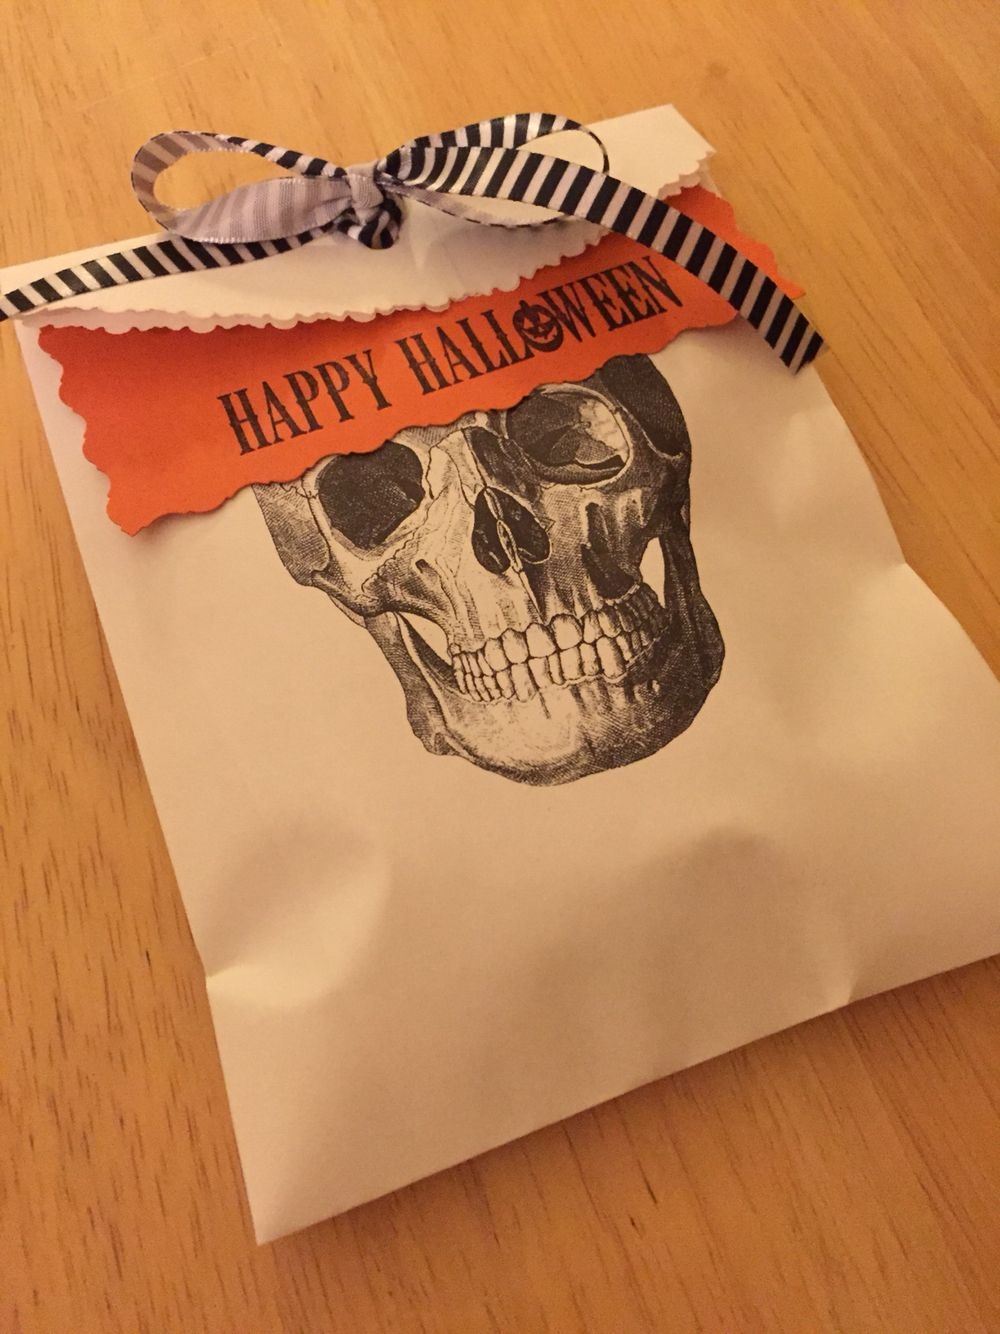 Halloween gift for coworkers. Just Snicker Doodle cookies